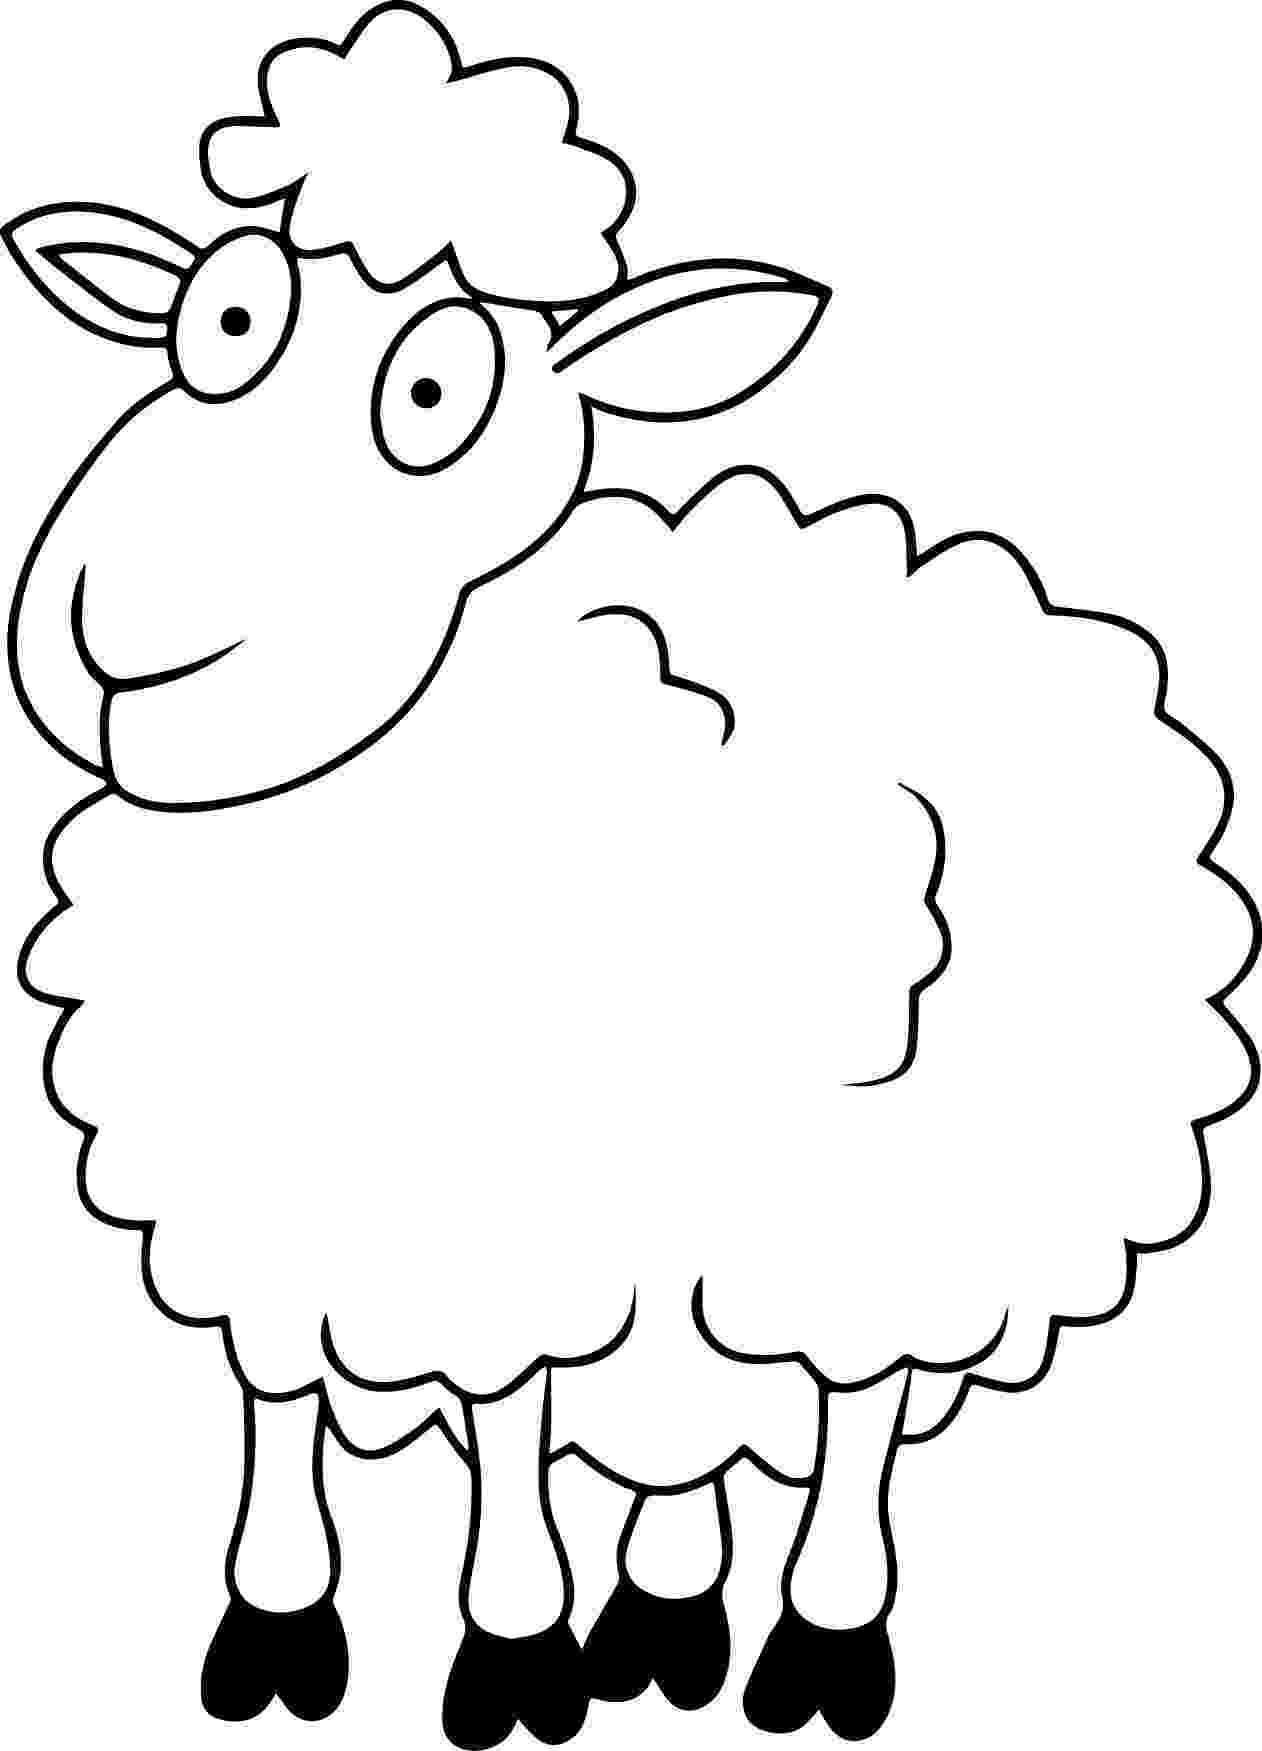 lamb coloring sheet sheep outline coloring page coloring home sheet coloring lamb